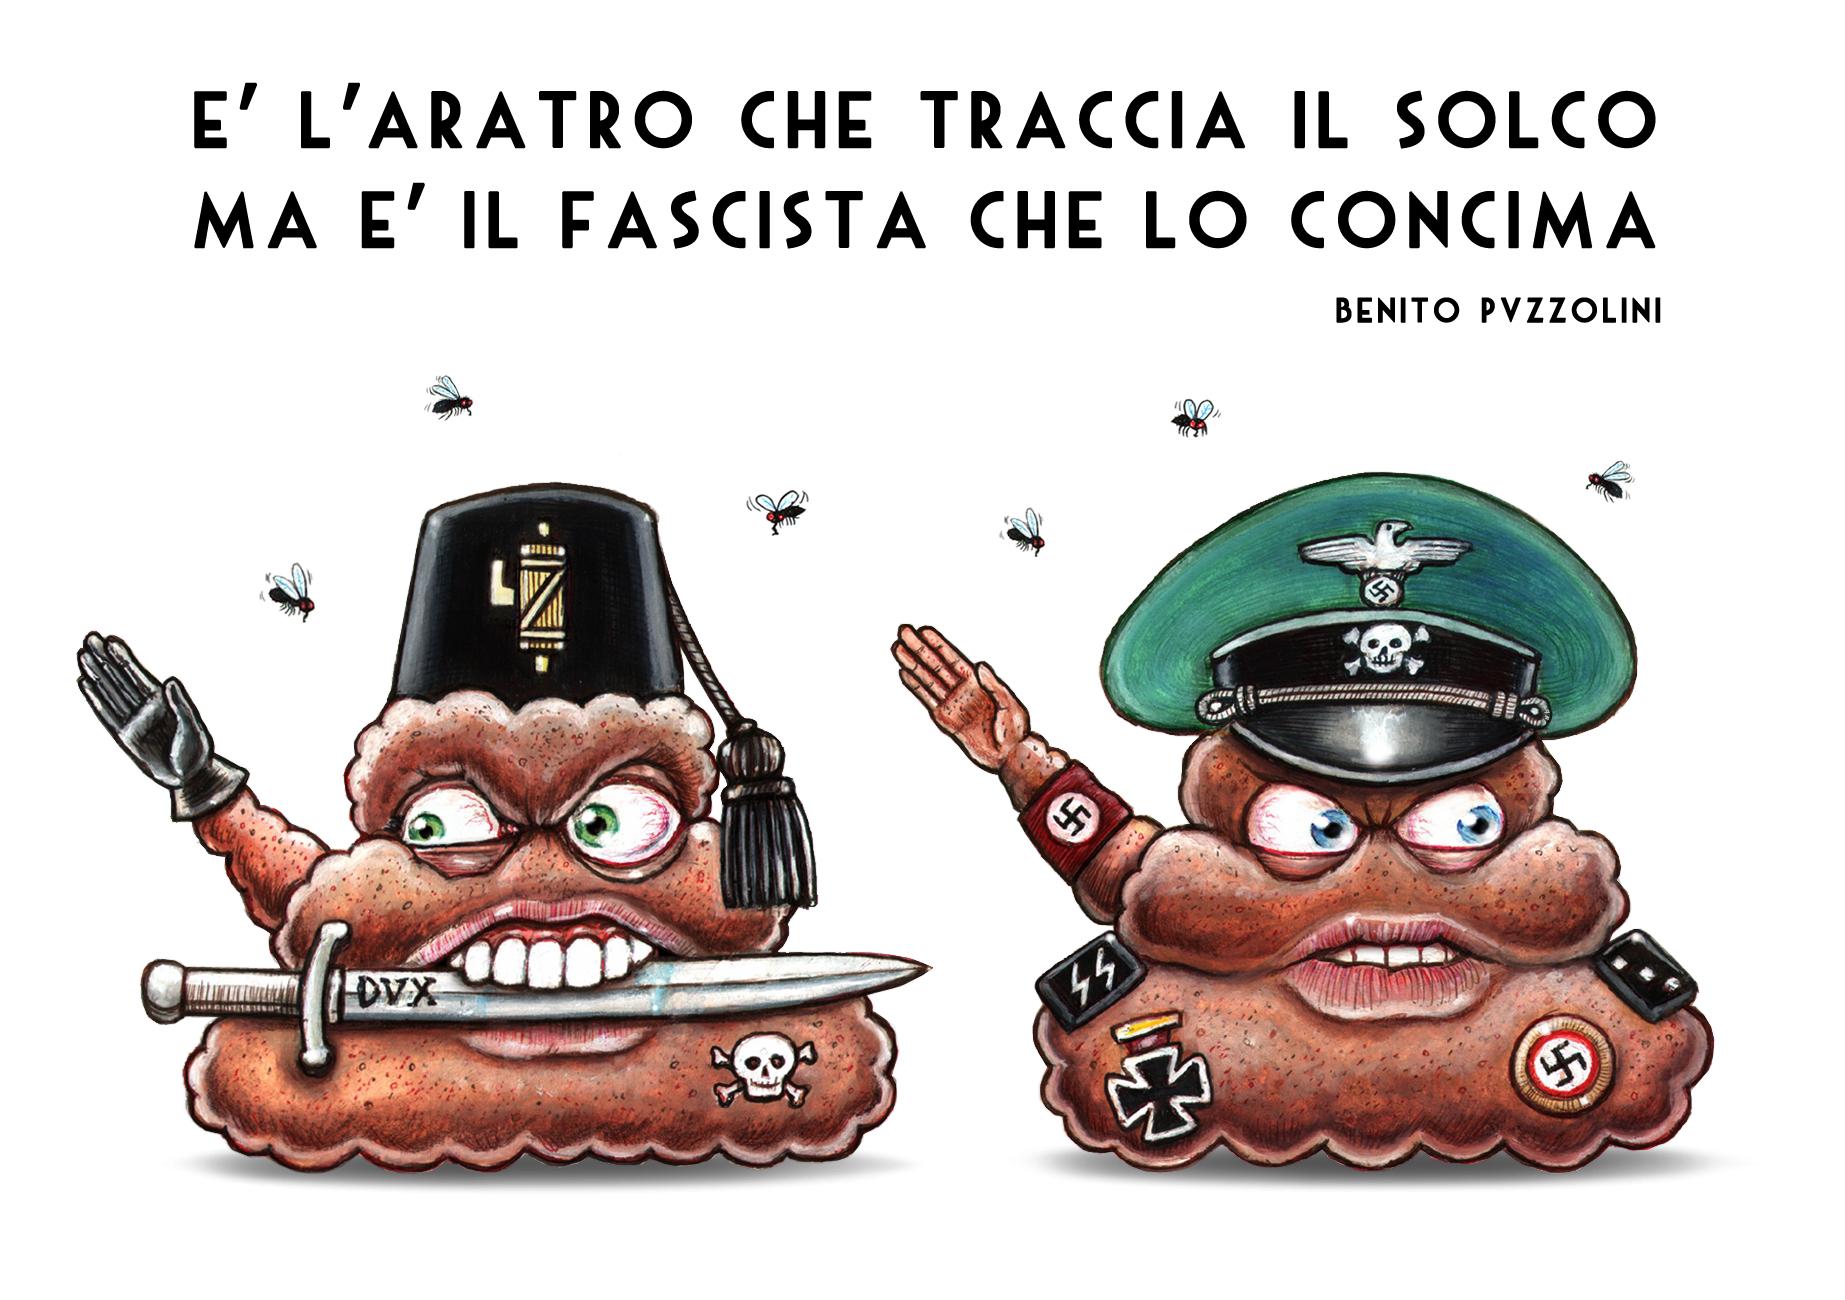 fasci concime - graficanera - NO COPYRIGHT